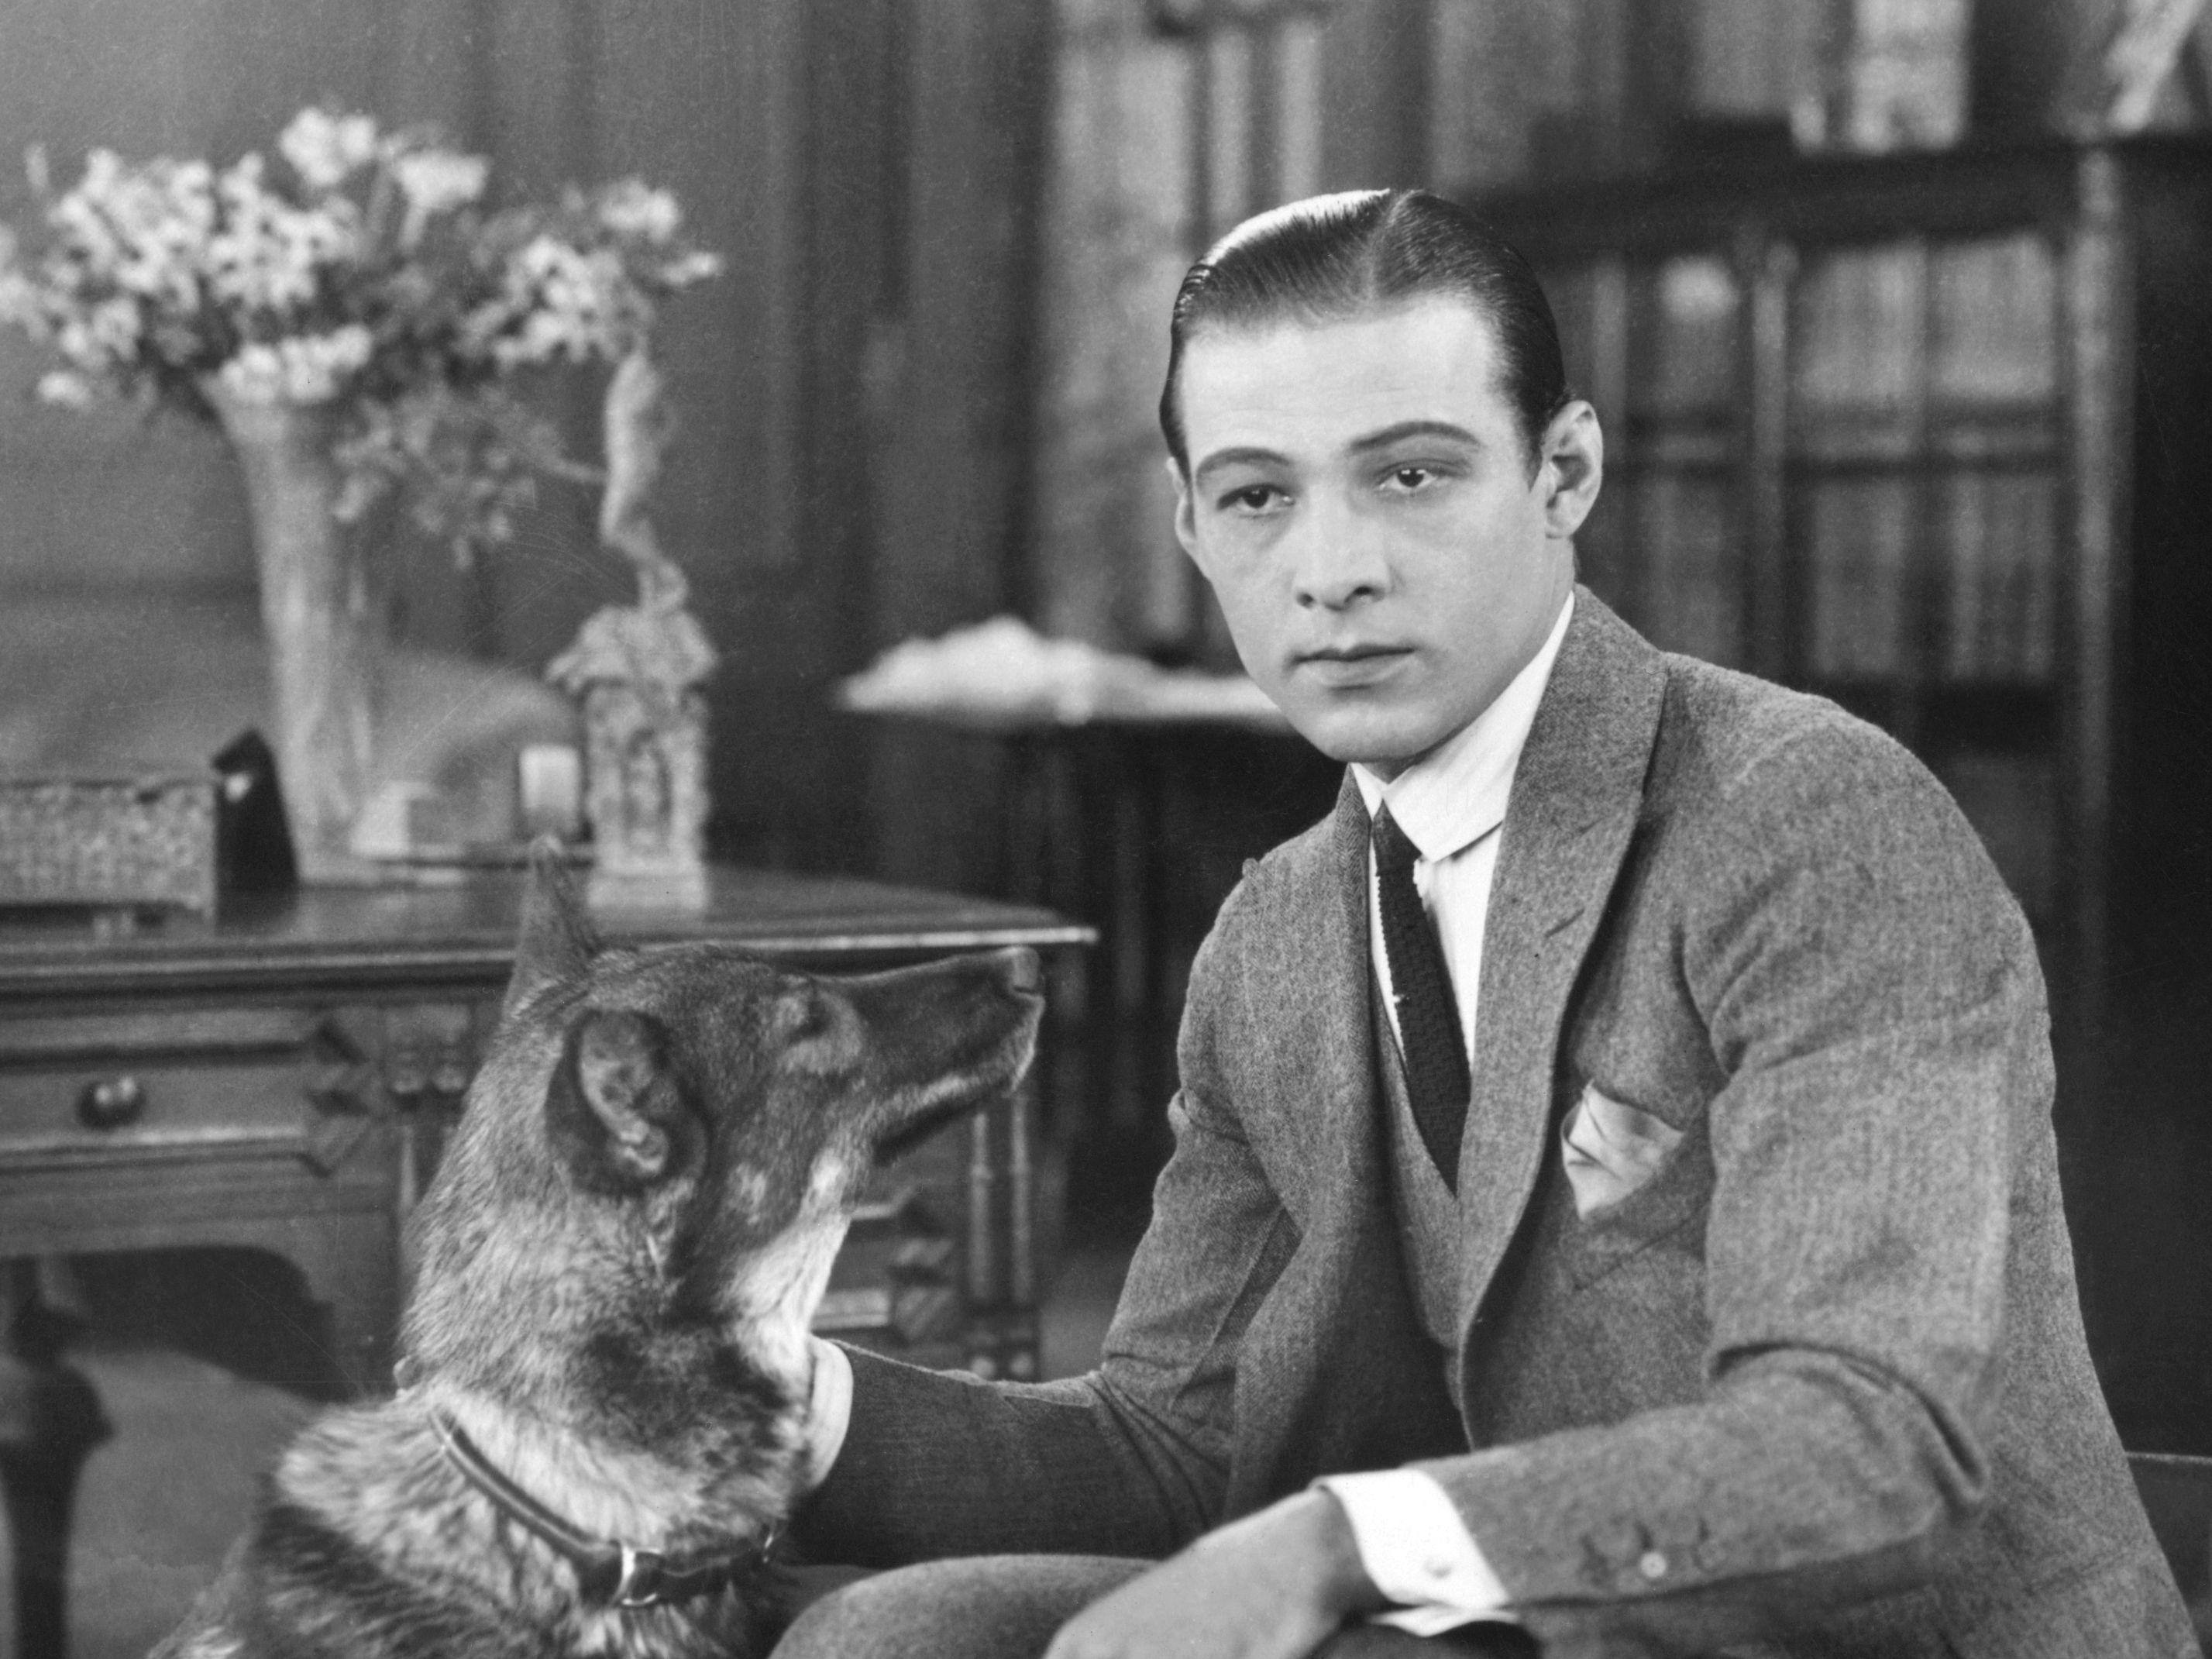 Rudolph Valentino Biography